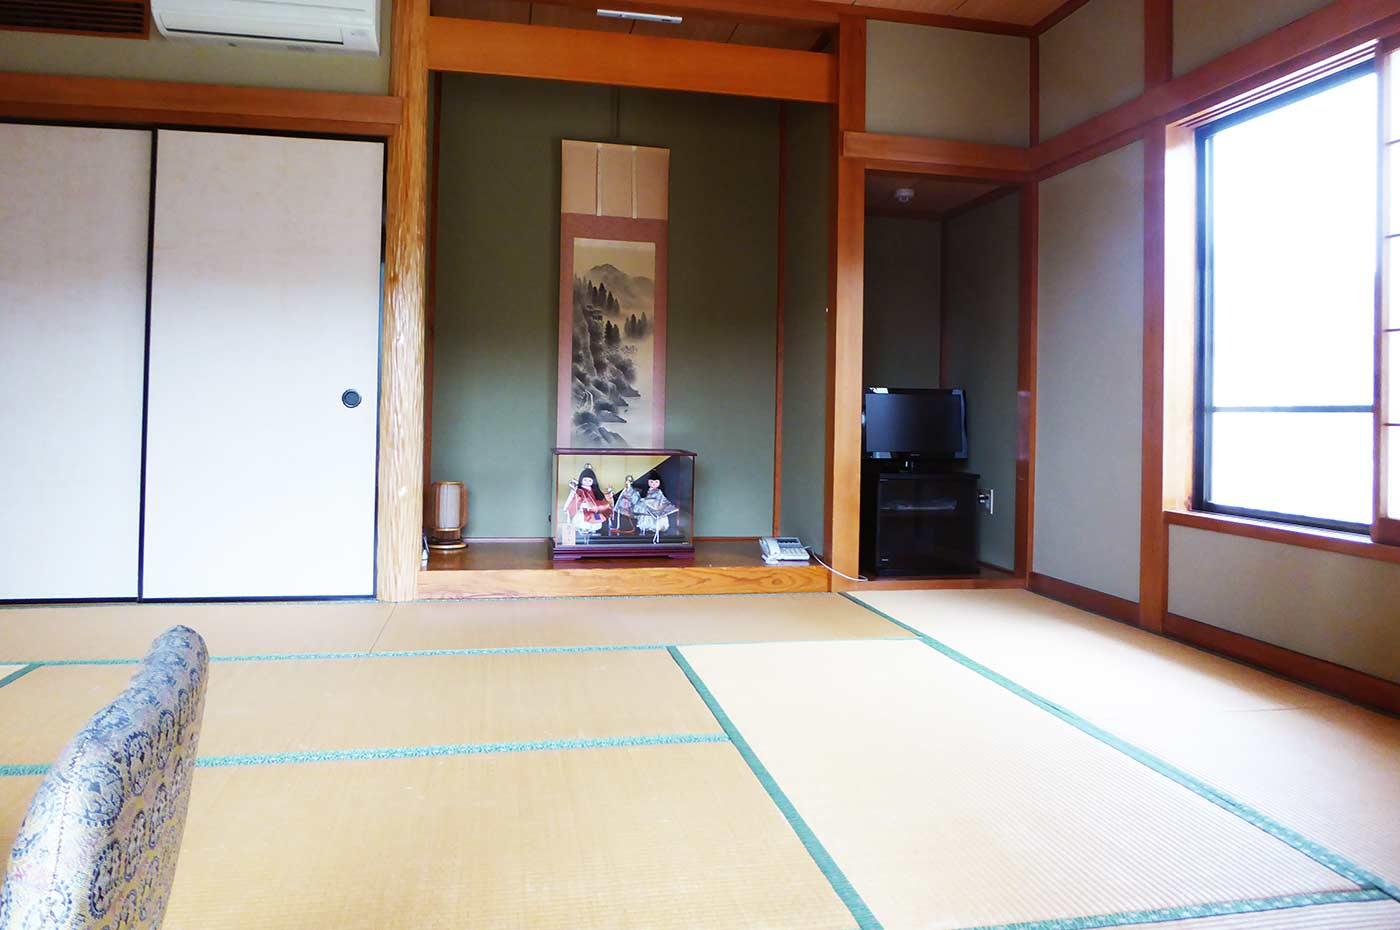 福喜庵の宿泊部屋